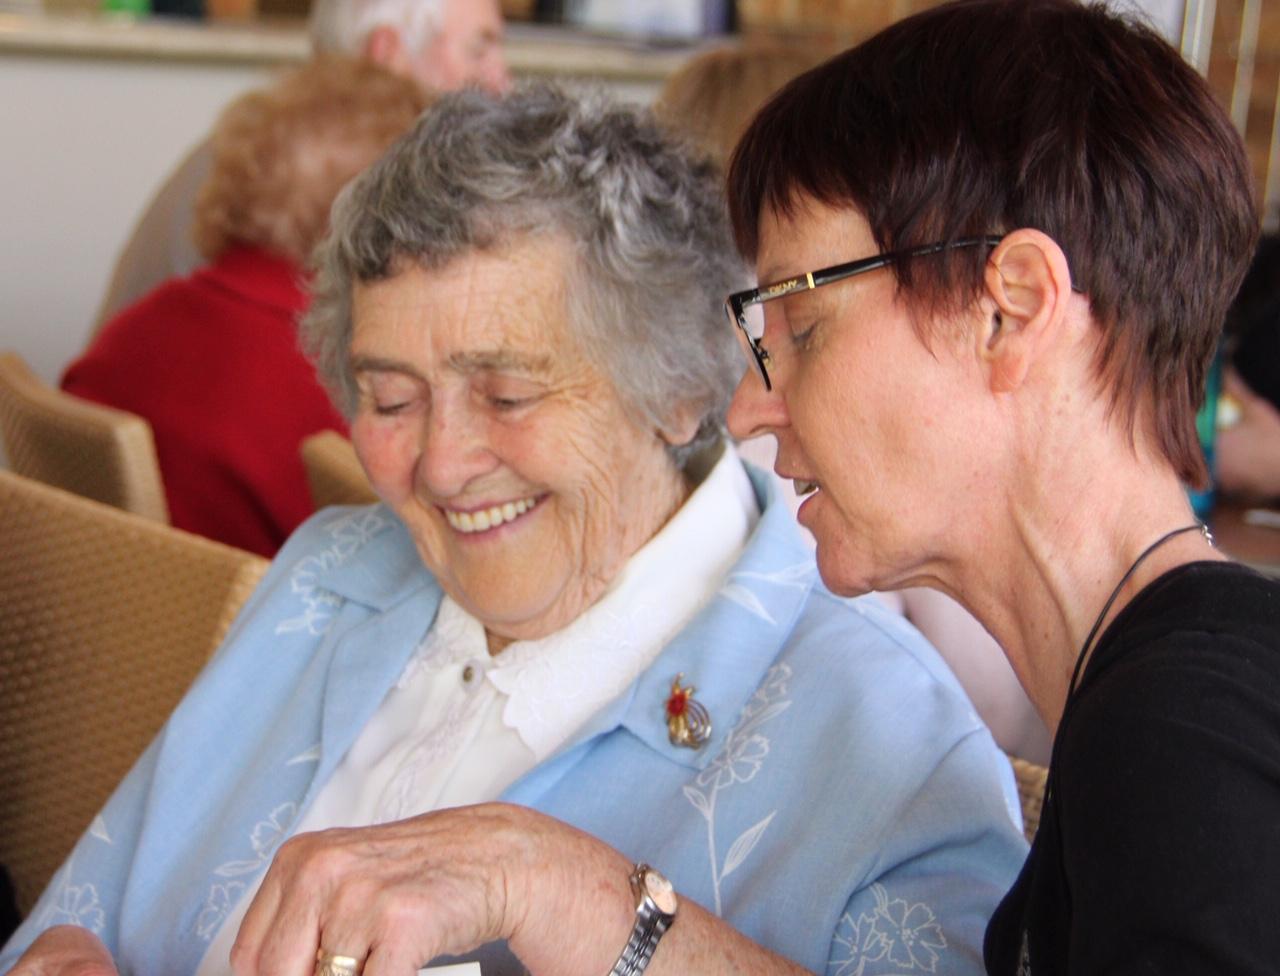 Nurses are vital to the aged care workforce